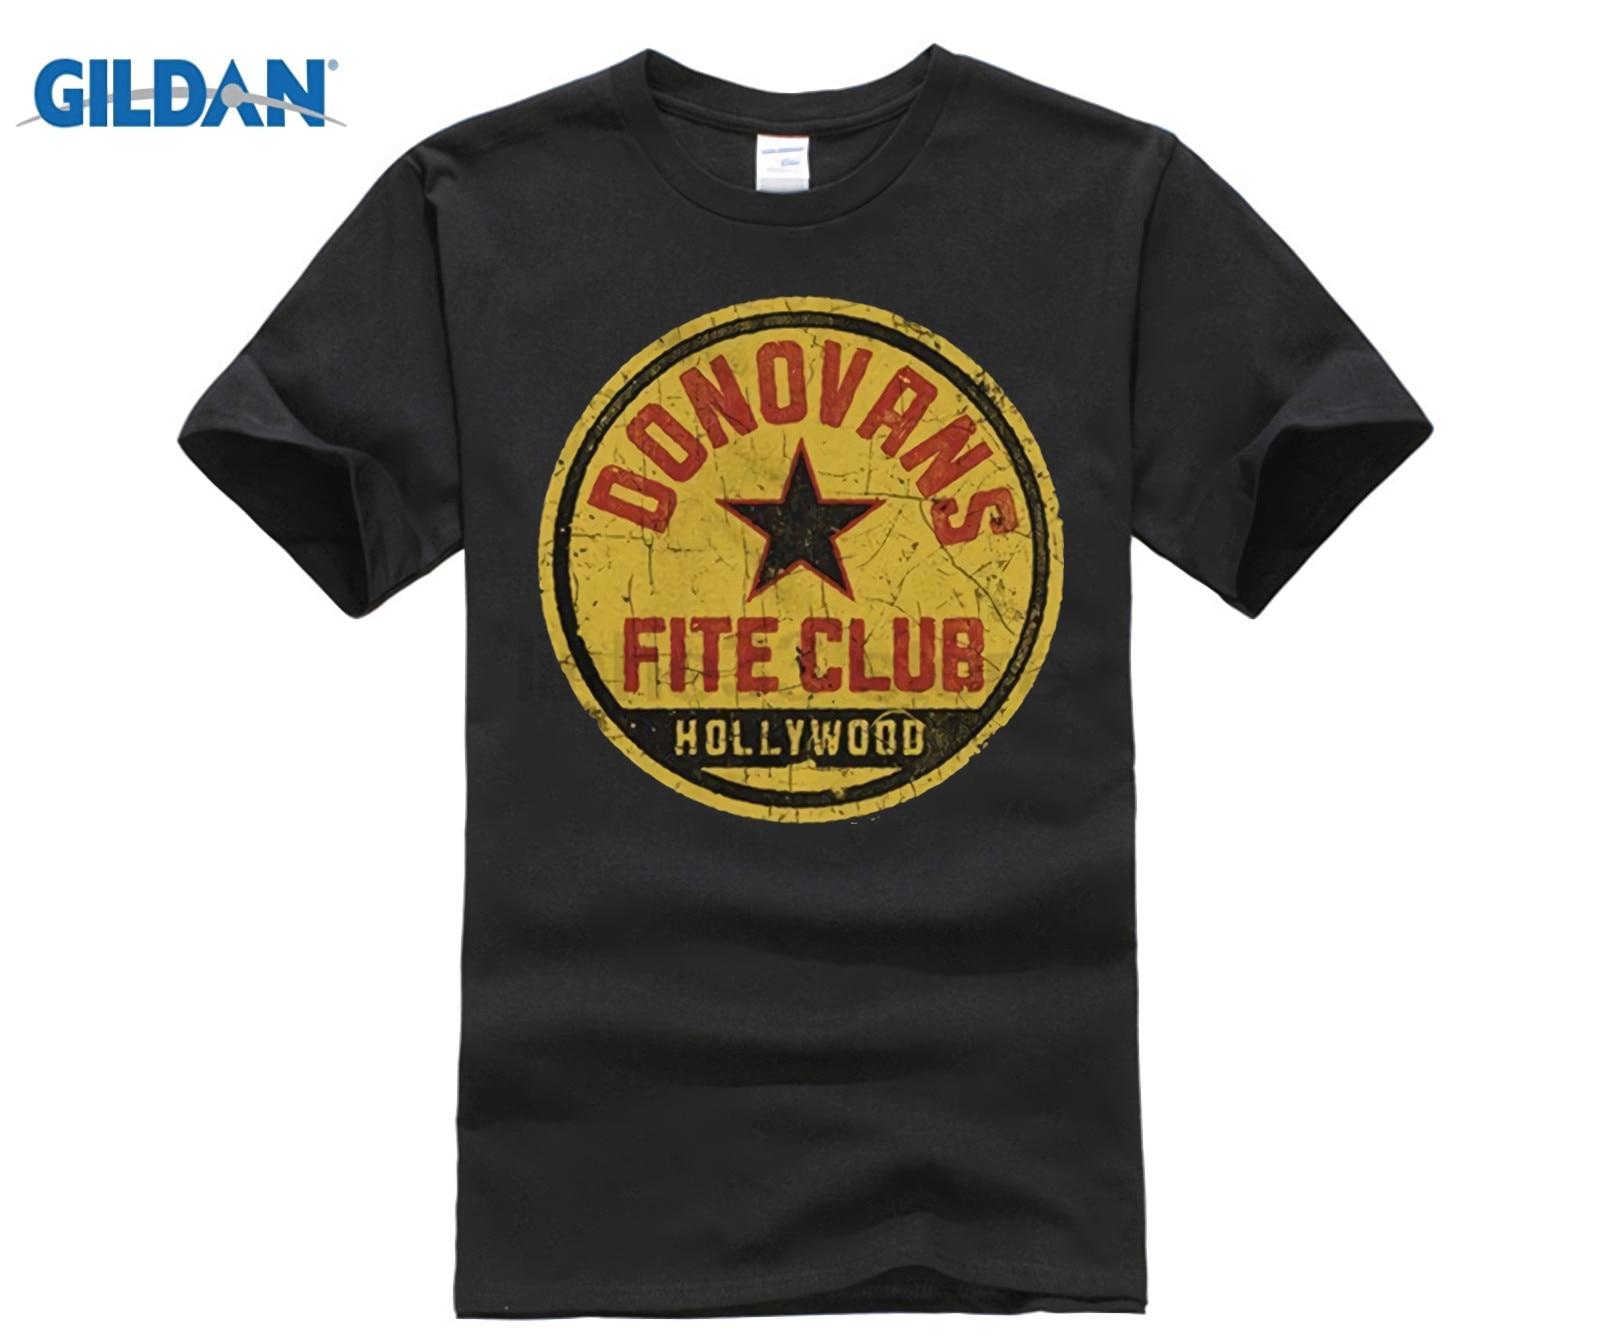 Pantalón corto Casual de manga corta Tee Ray Donovan Fite Club adulto Slim Fit camiseta 016086